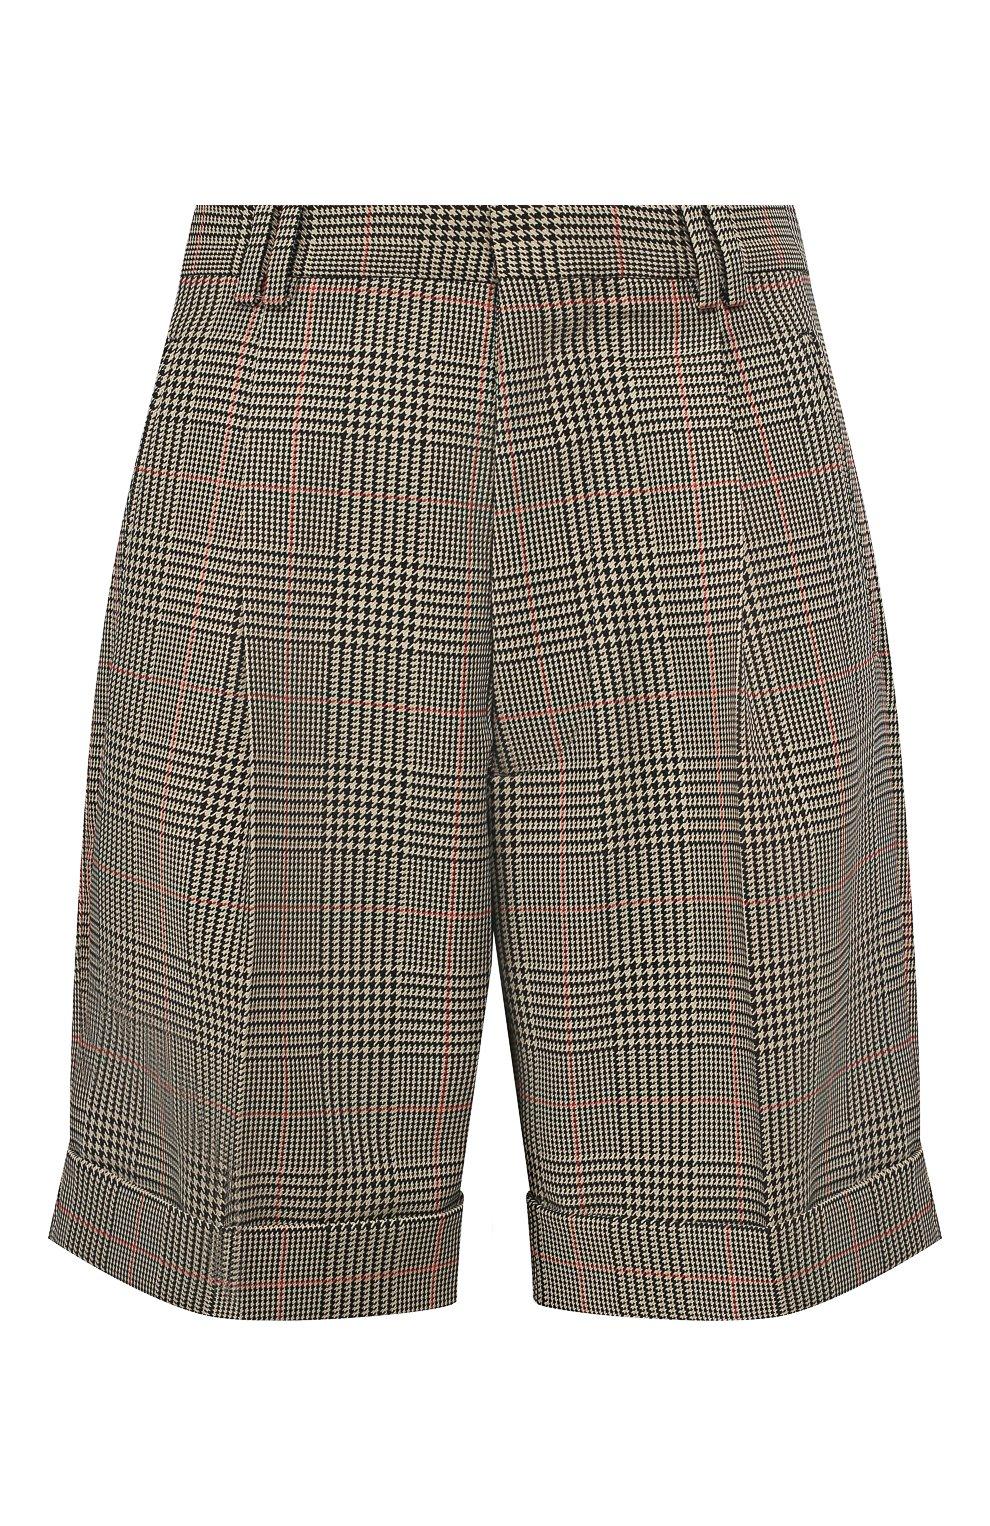 Женские шорты MAISON MARGIELA коричневого цвета, арт. S51MU0051/S52581 | Фото 1